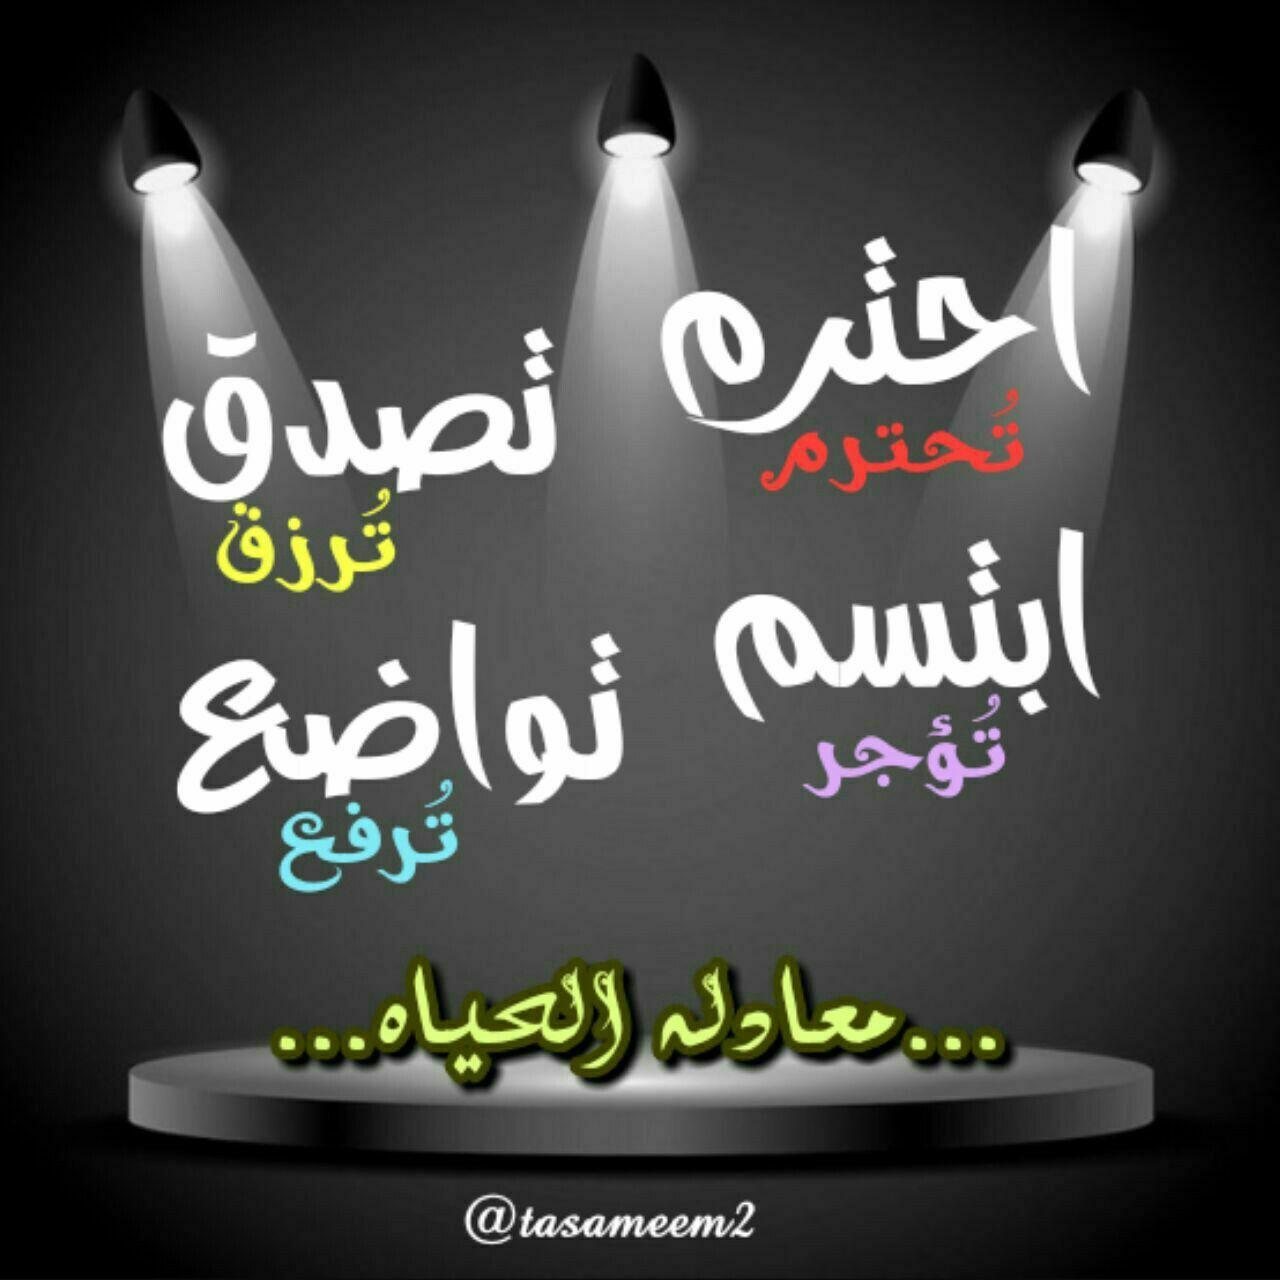 Pin By رحمة عبد الهادي On أجيب دعوة الداعي Words Of Wisdom Words Wisdom